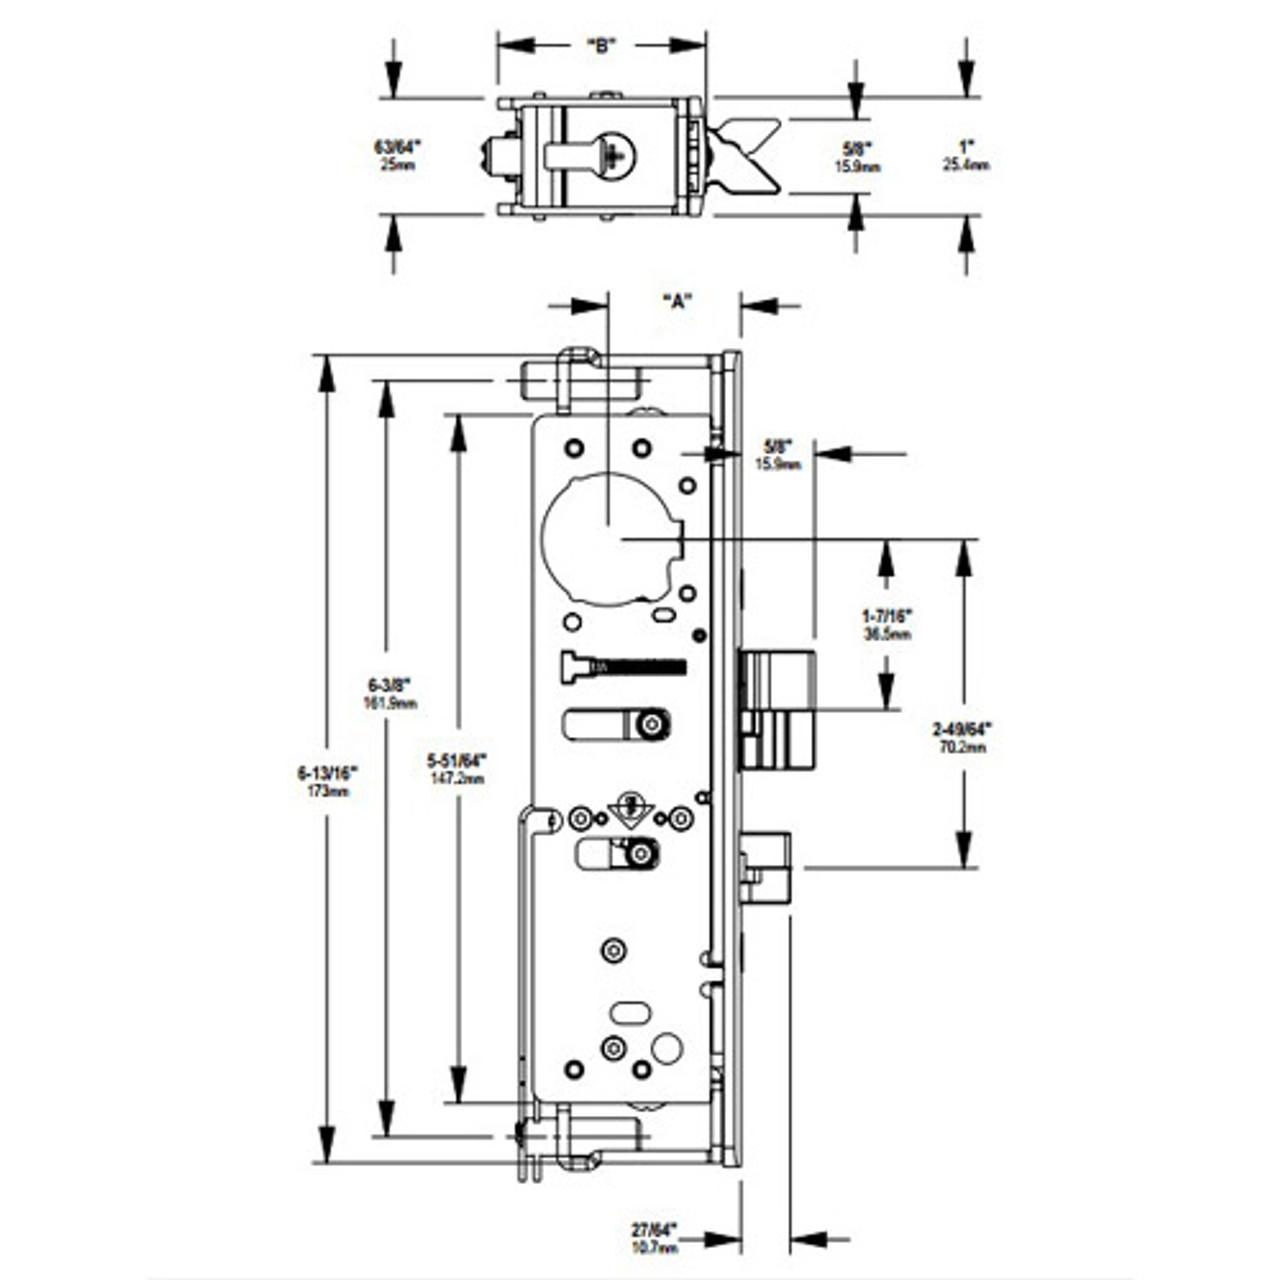 4300-20-101-313 Adams Rite Electrified Deadlatch Dimensional View